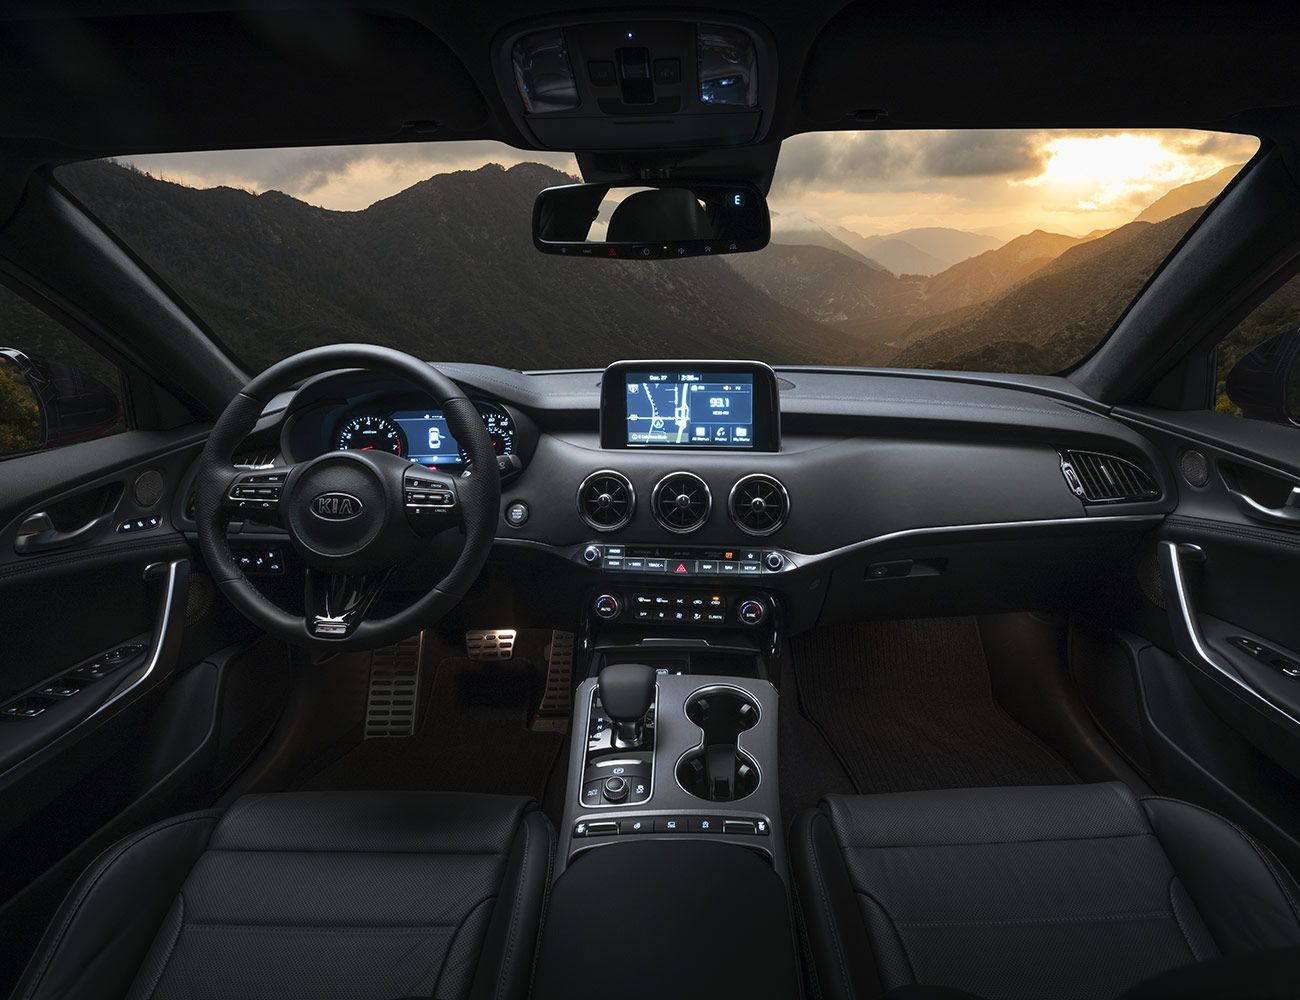 The 10 Best Car Interiors In 2018